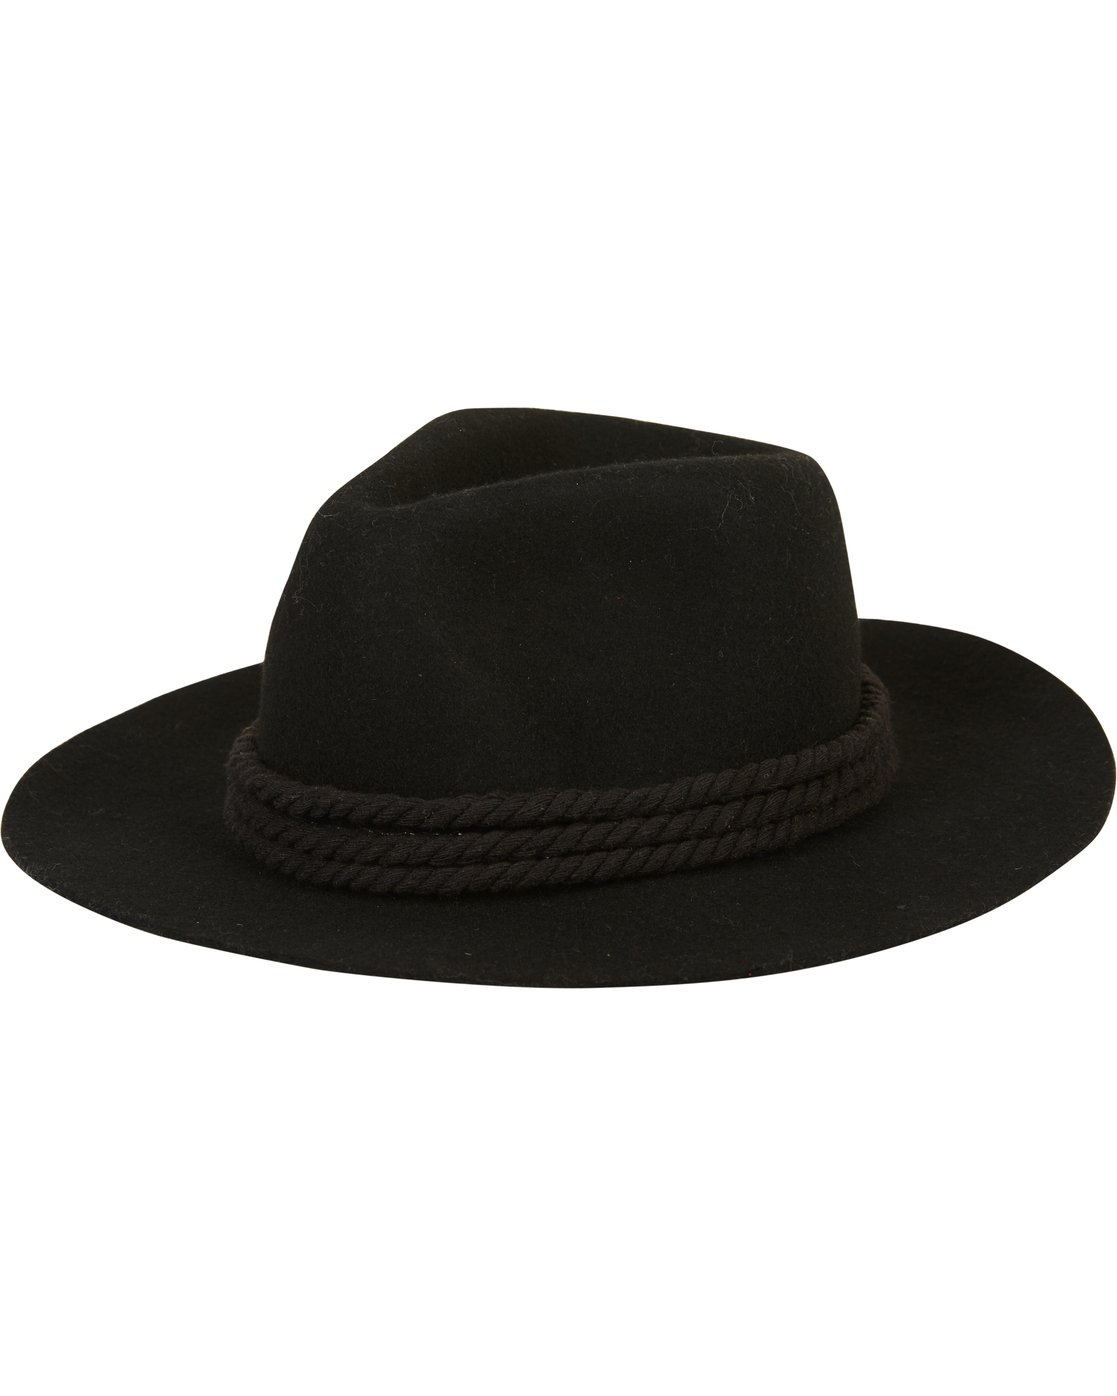 0d01befa6d3ef ... denmark 0 roped in felt hat black jahwsbro billabong 768bb 4e575